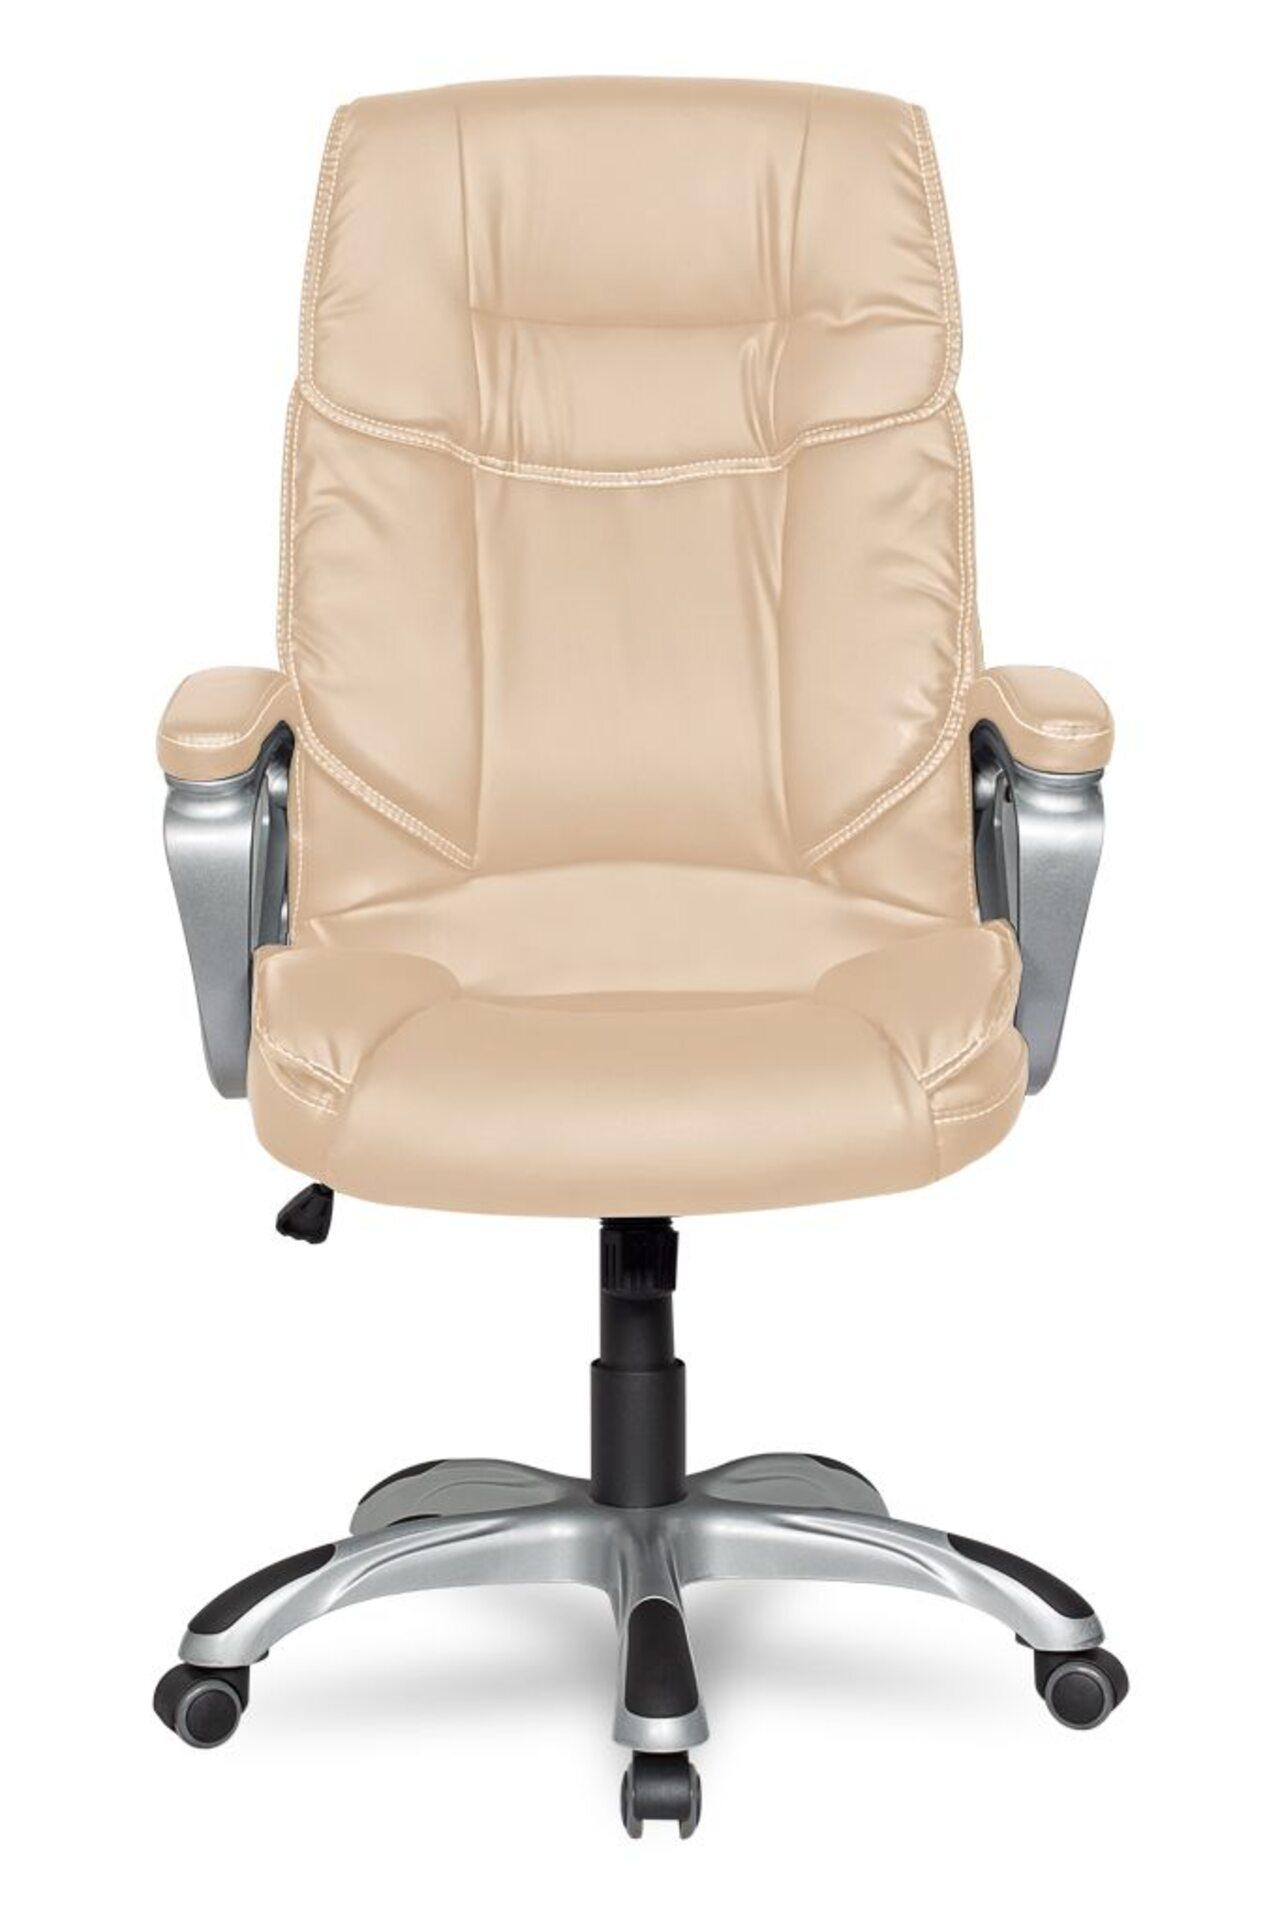 Кресло руководителя College CLG-615 LXH - фото 12